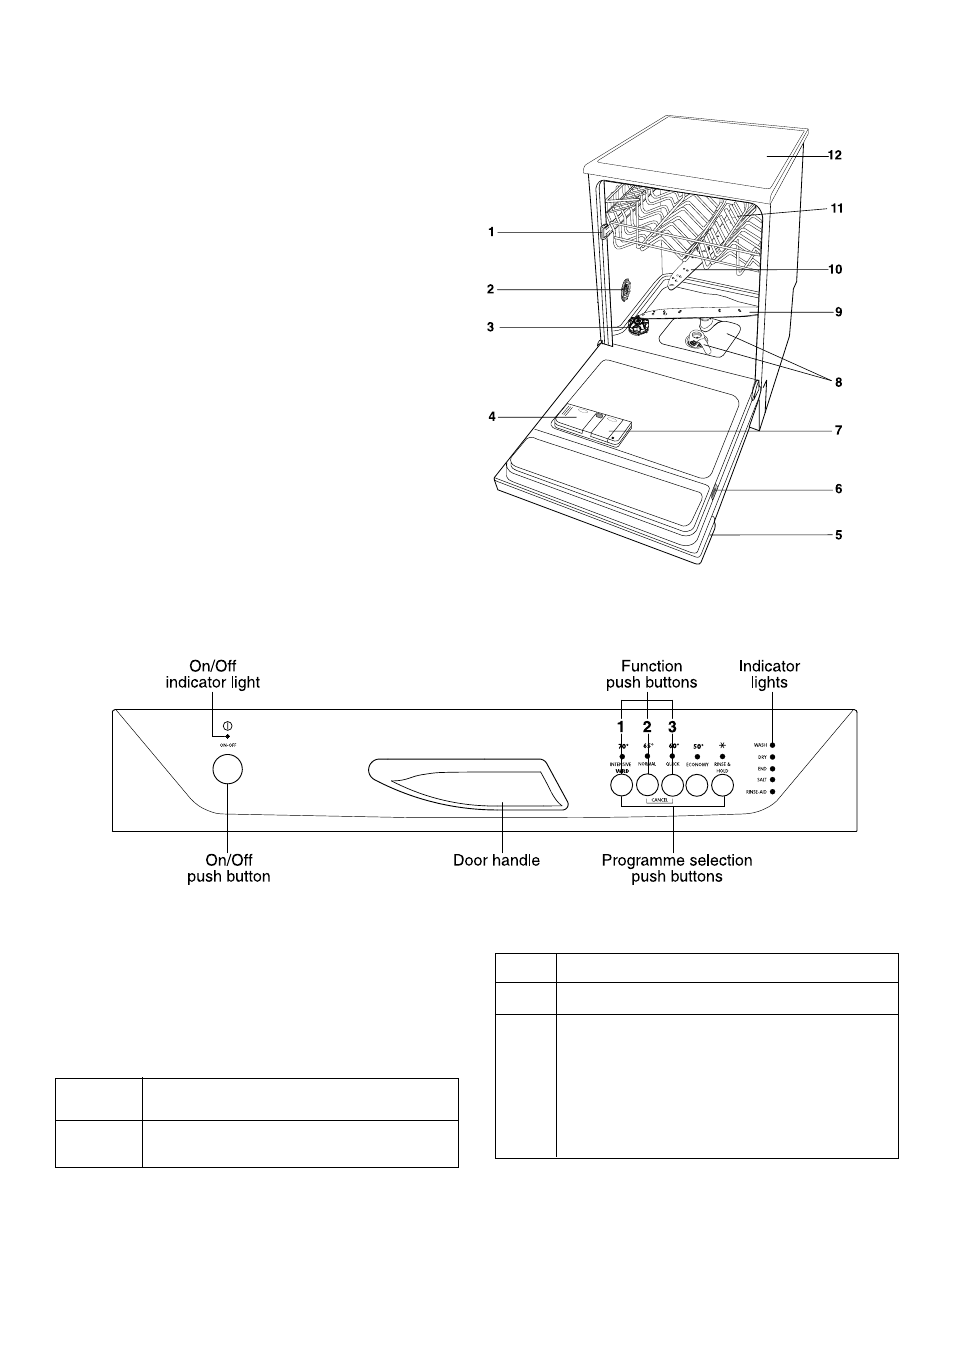 the control panel description of the appliance zanussi de 6850 rh manualsdir com